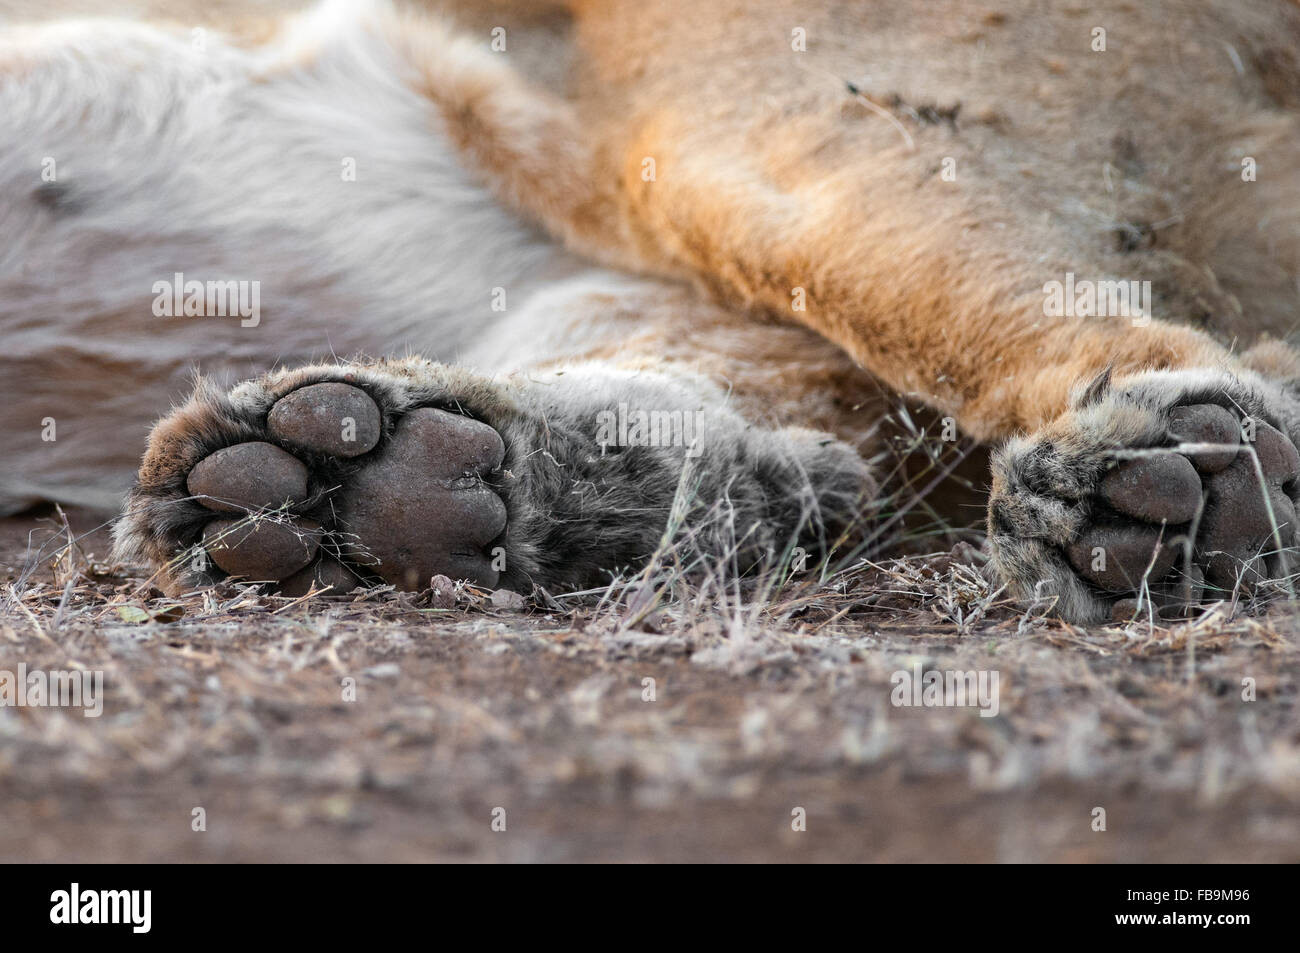 Lion Paws - Stock Image